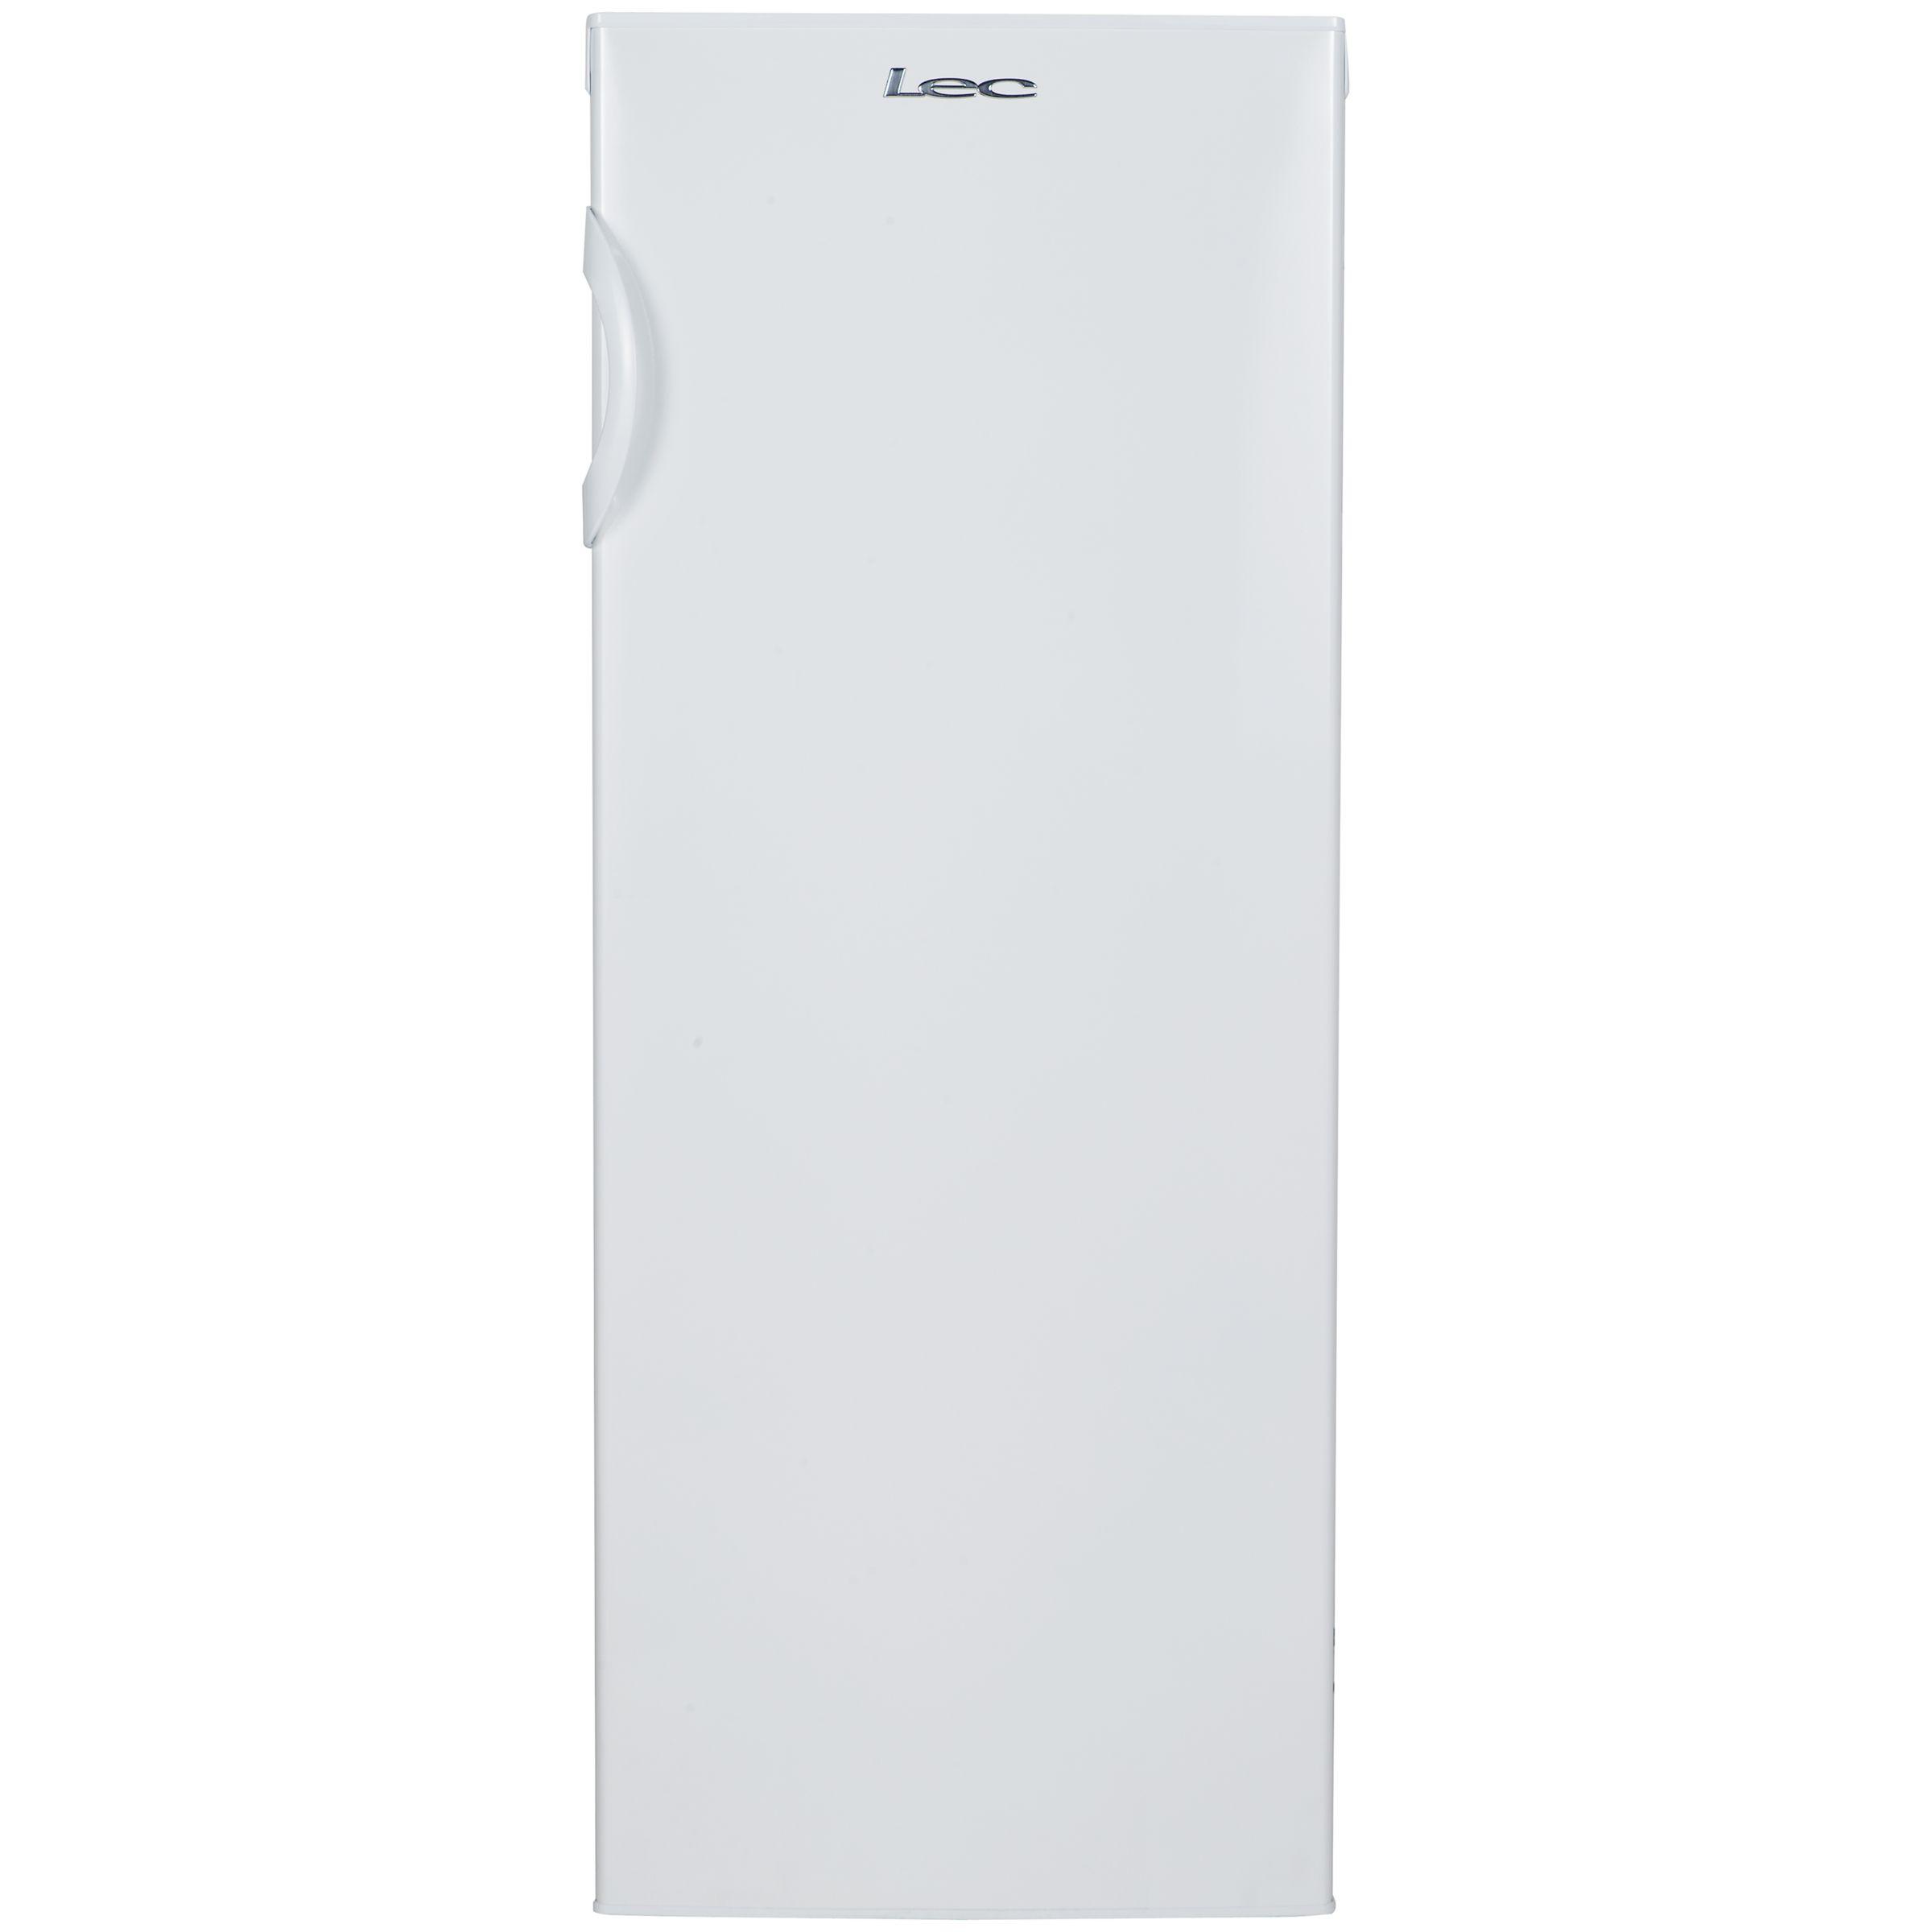 LEC Lec TU55144W Freestanding Tall Freezer, A+ Energy Rating, 55cm Wide, White